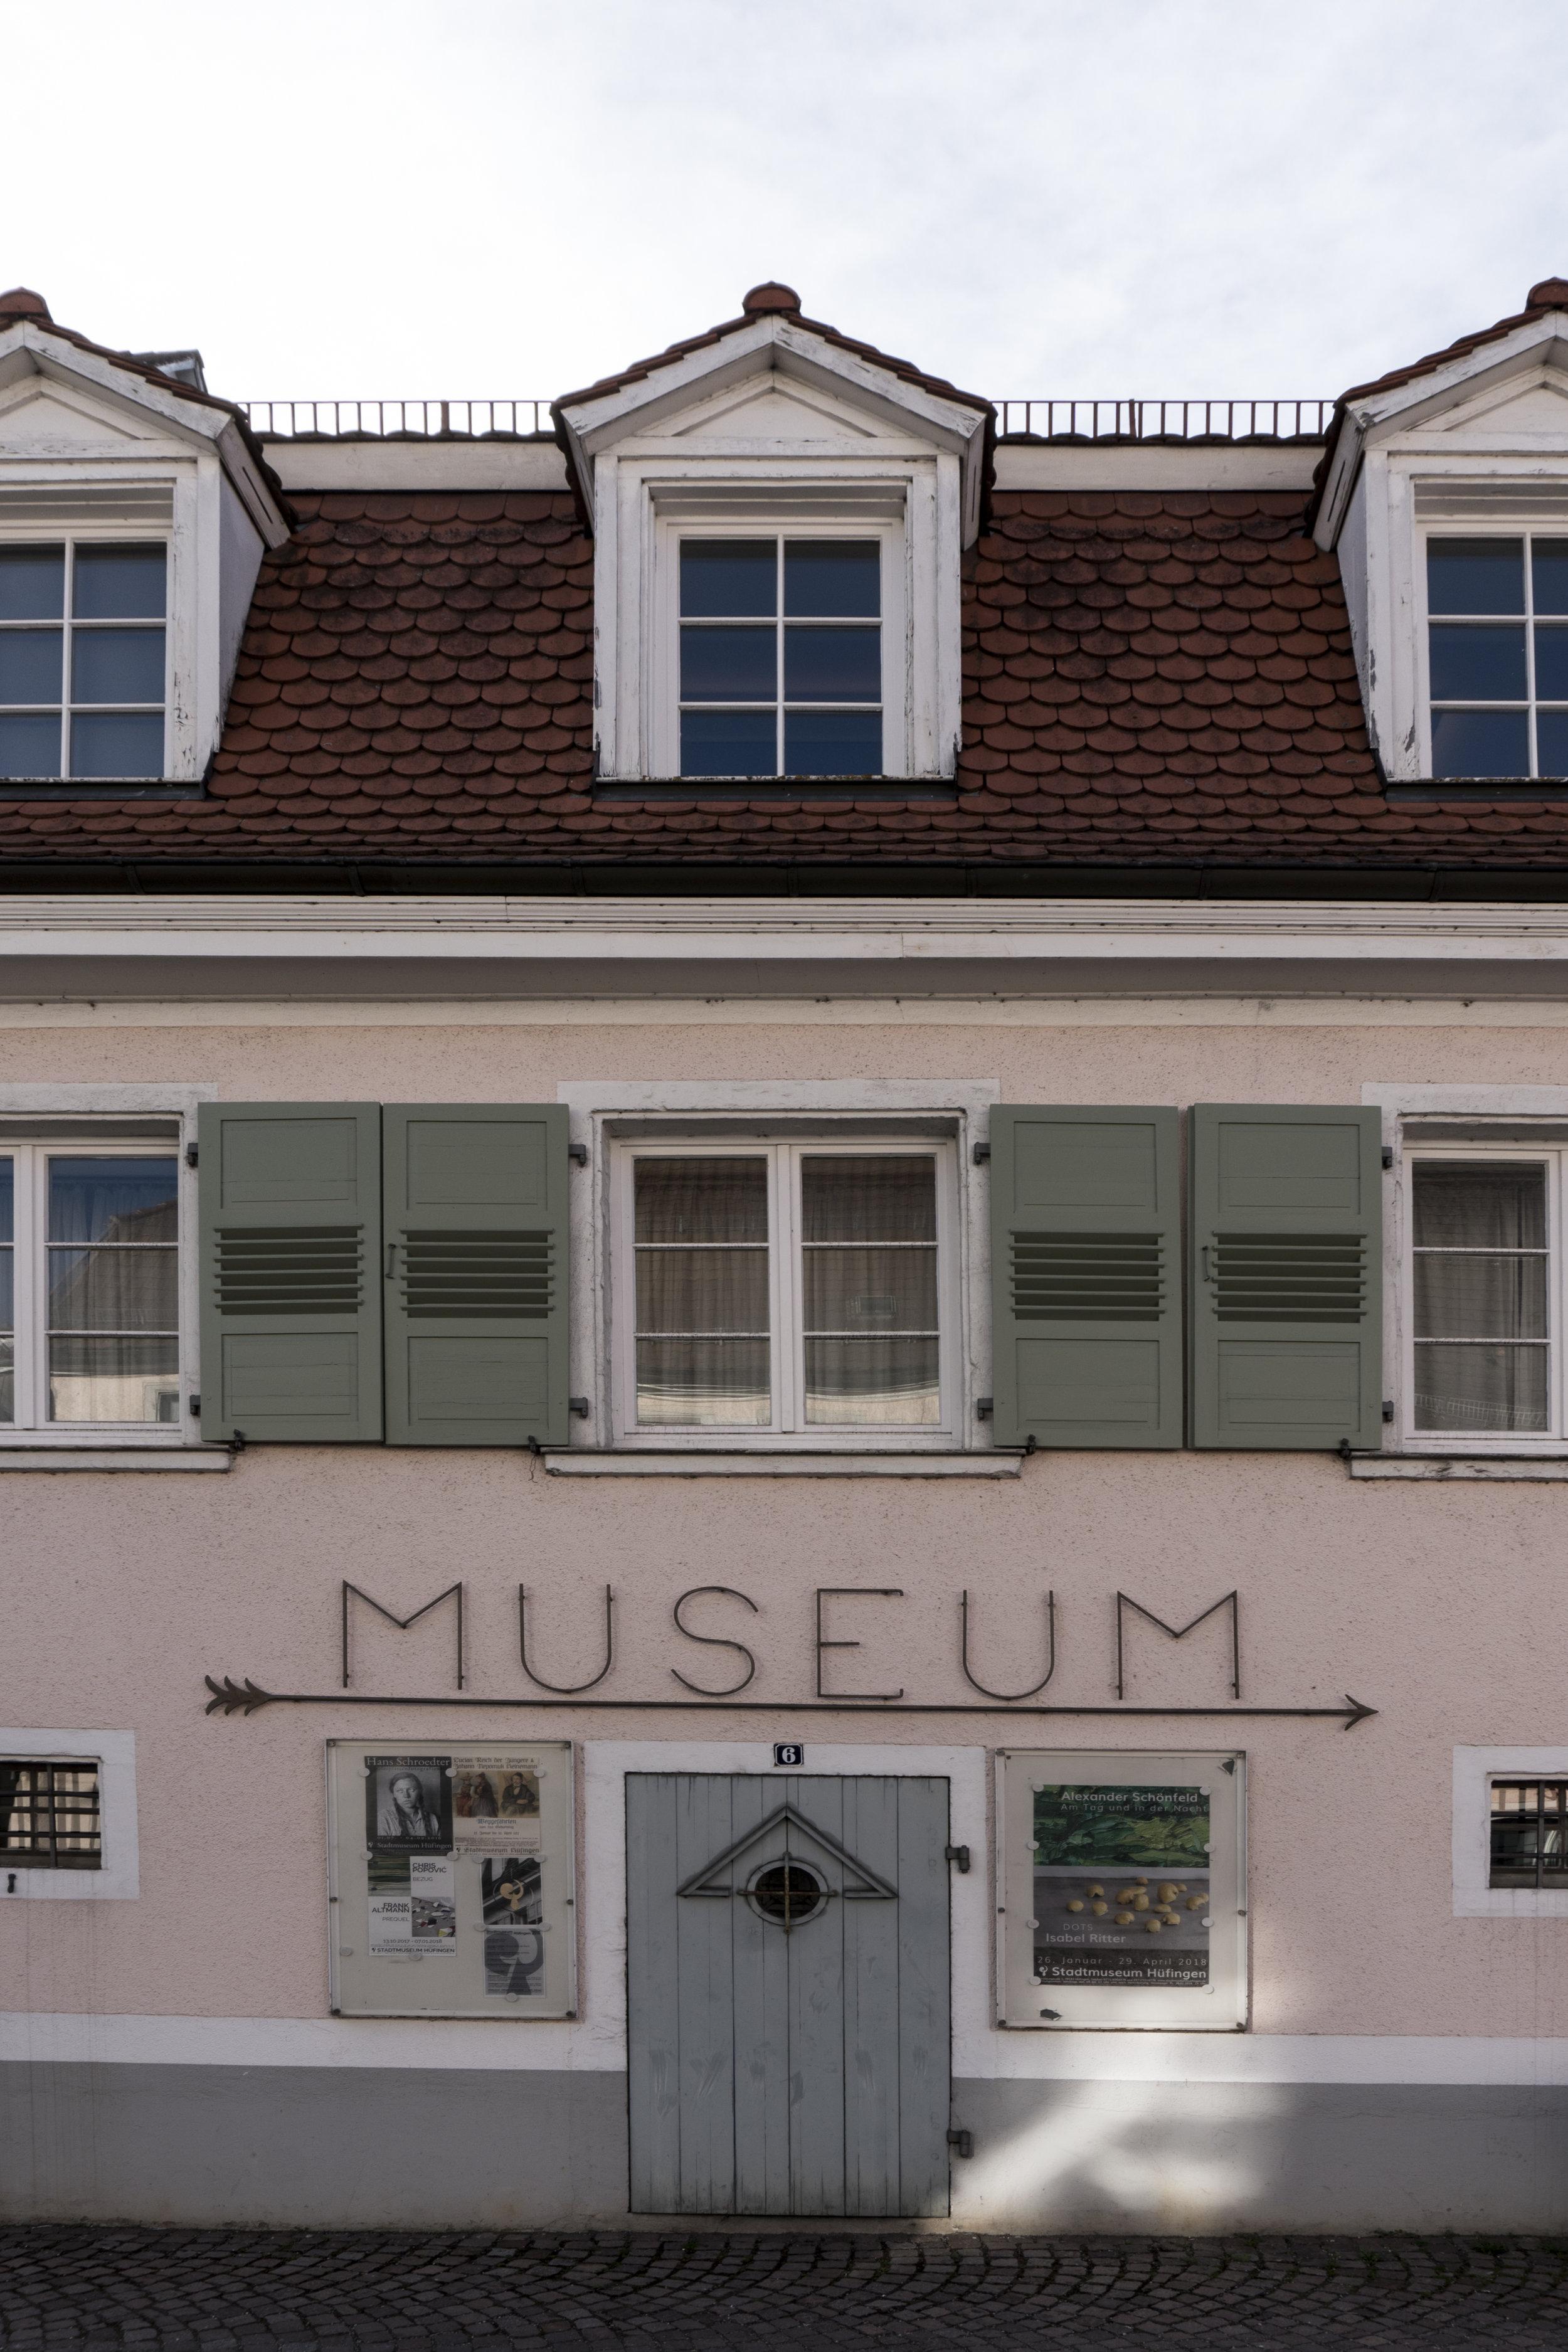 StadtMuseum, Hüfingen